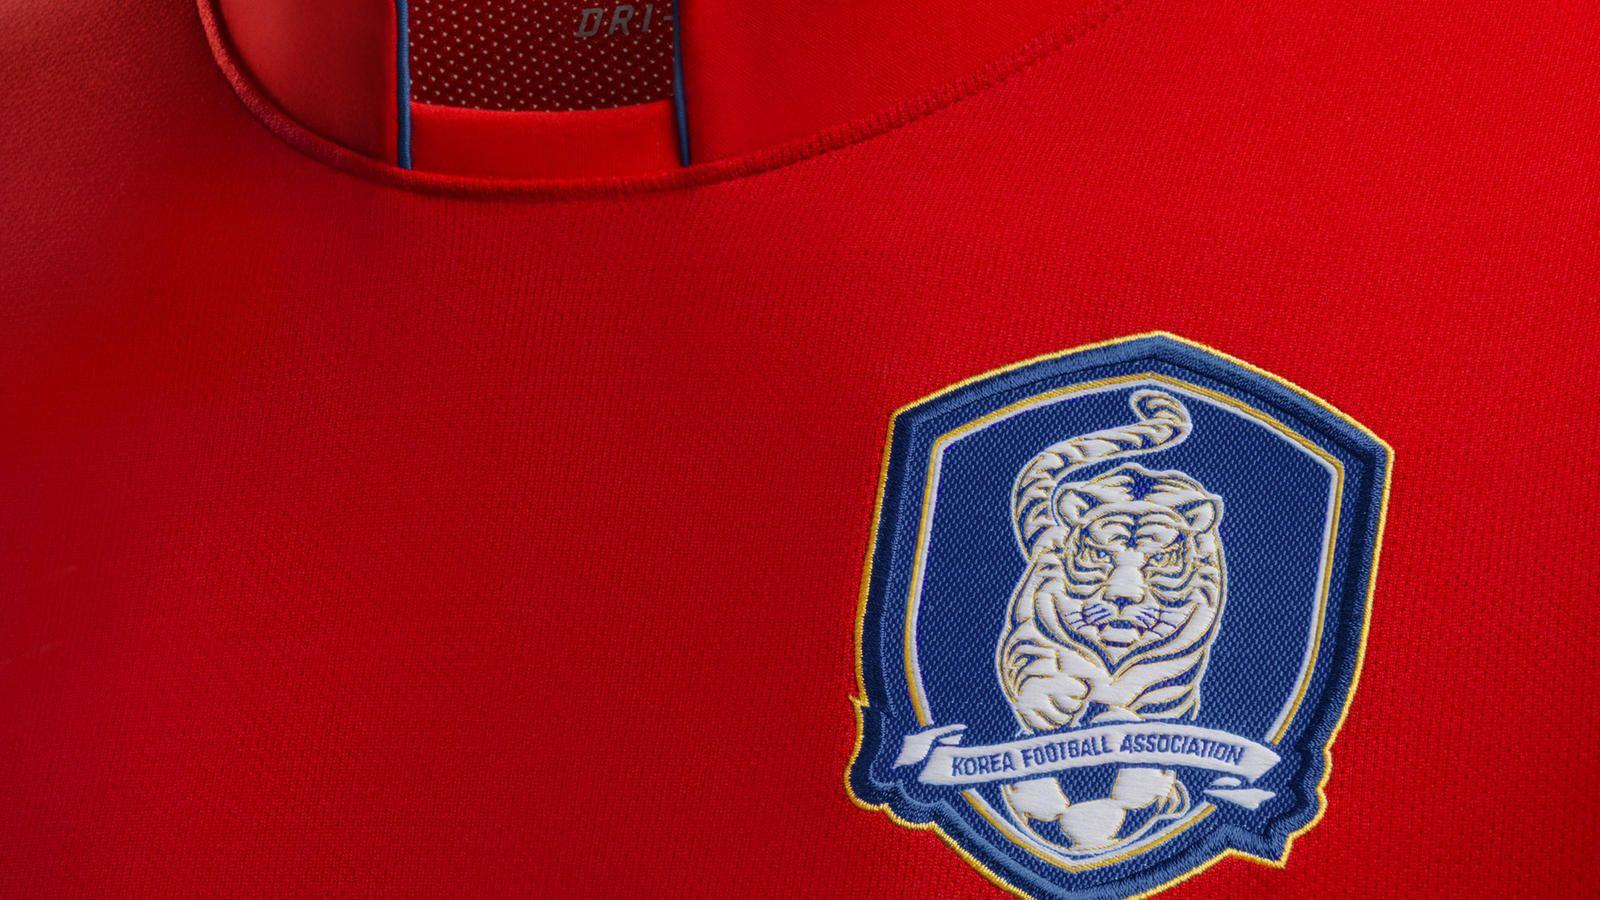 South Korea National Football Background 8